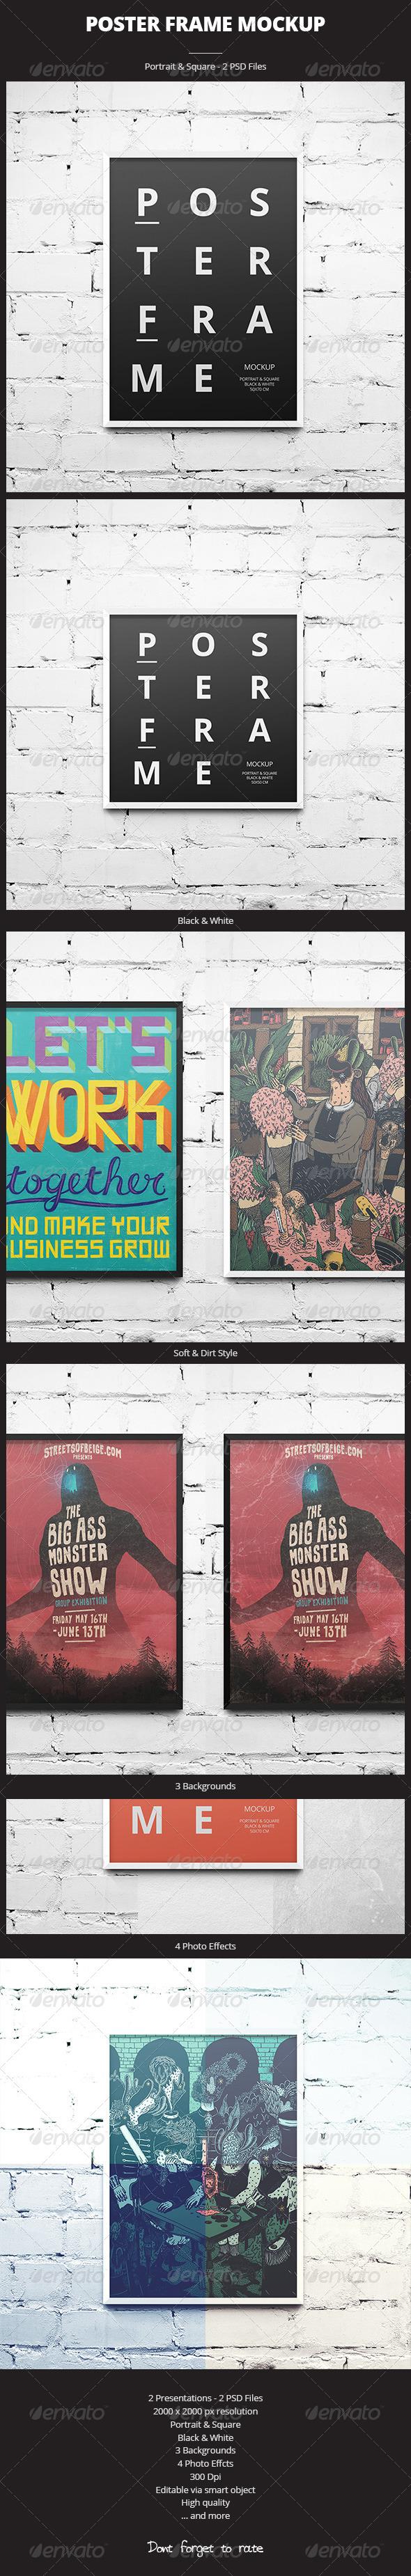 Poster Frame Mockup - Print Product Mock-Ups